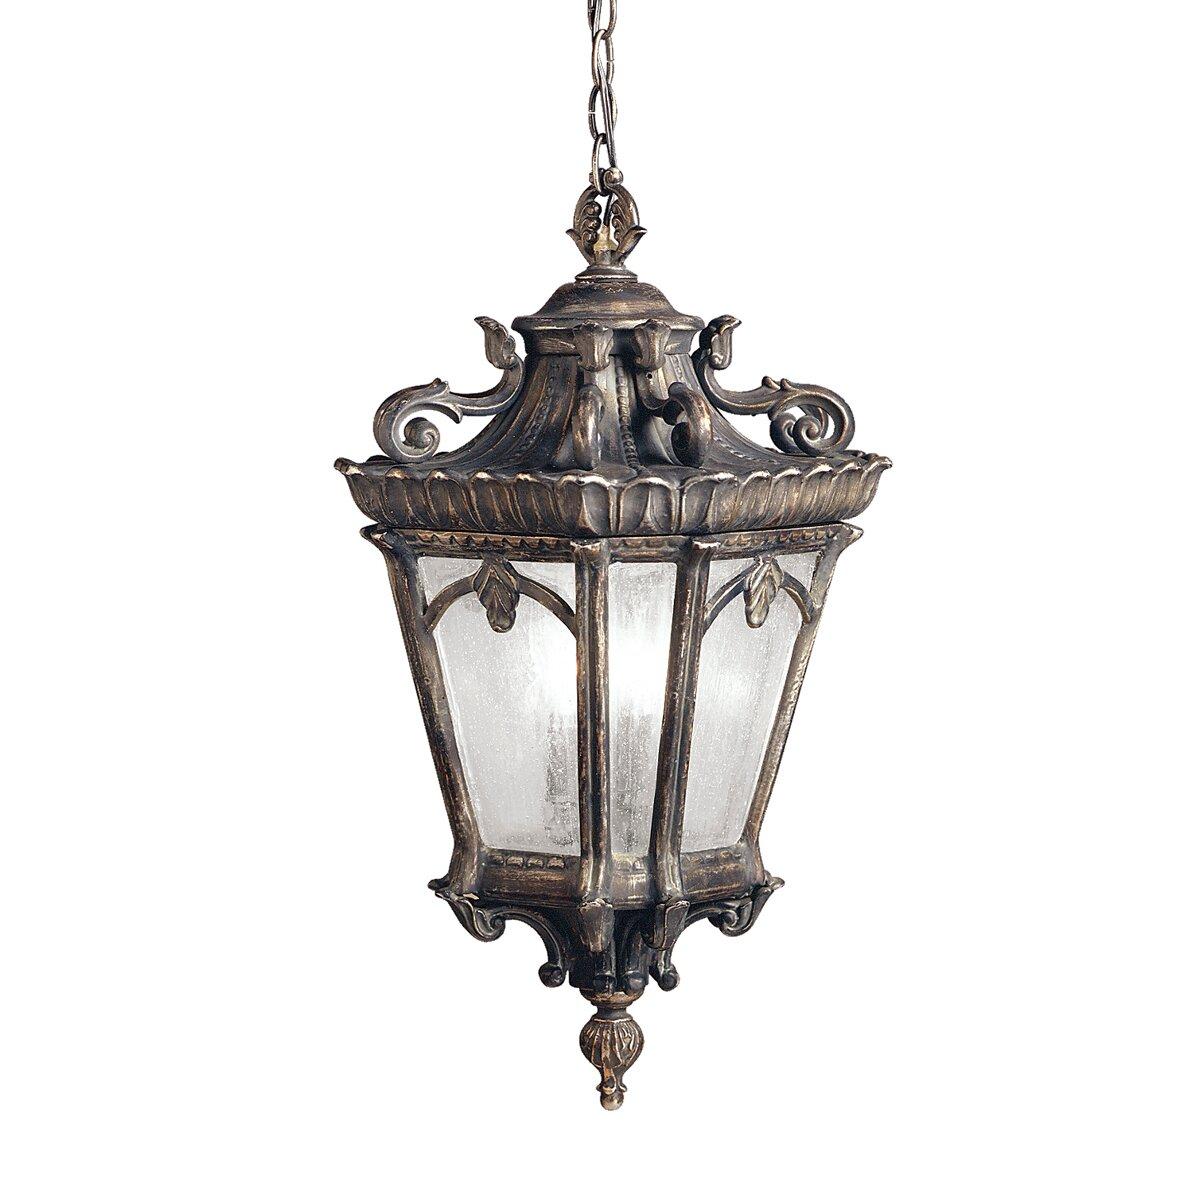 Kichler Landscape Lighting Reviews : Kichler tournai light outdoor hanging lantern reviews